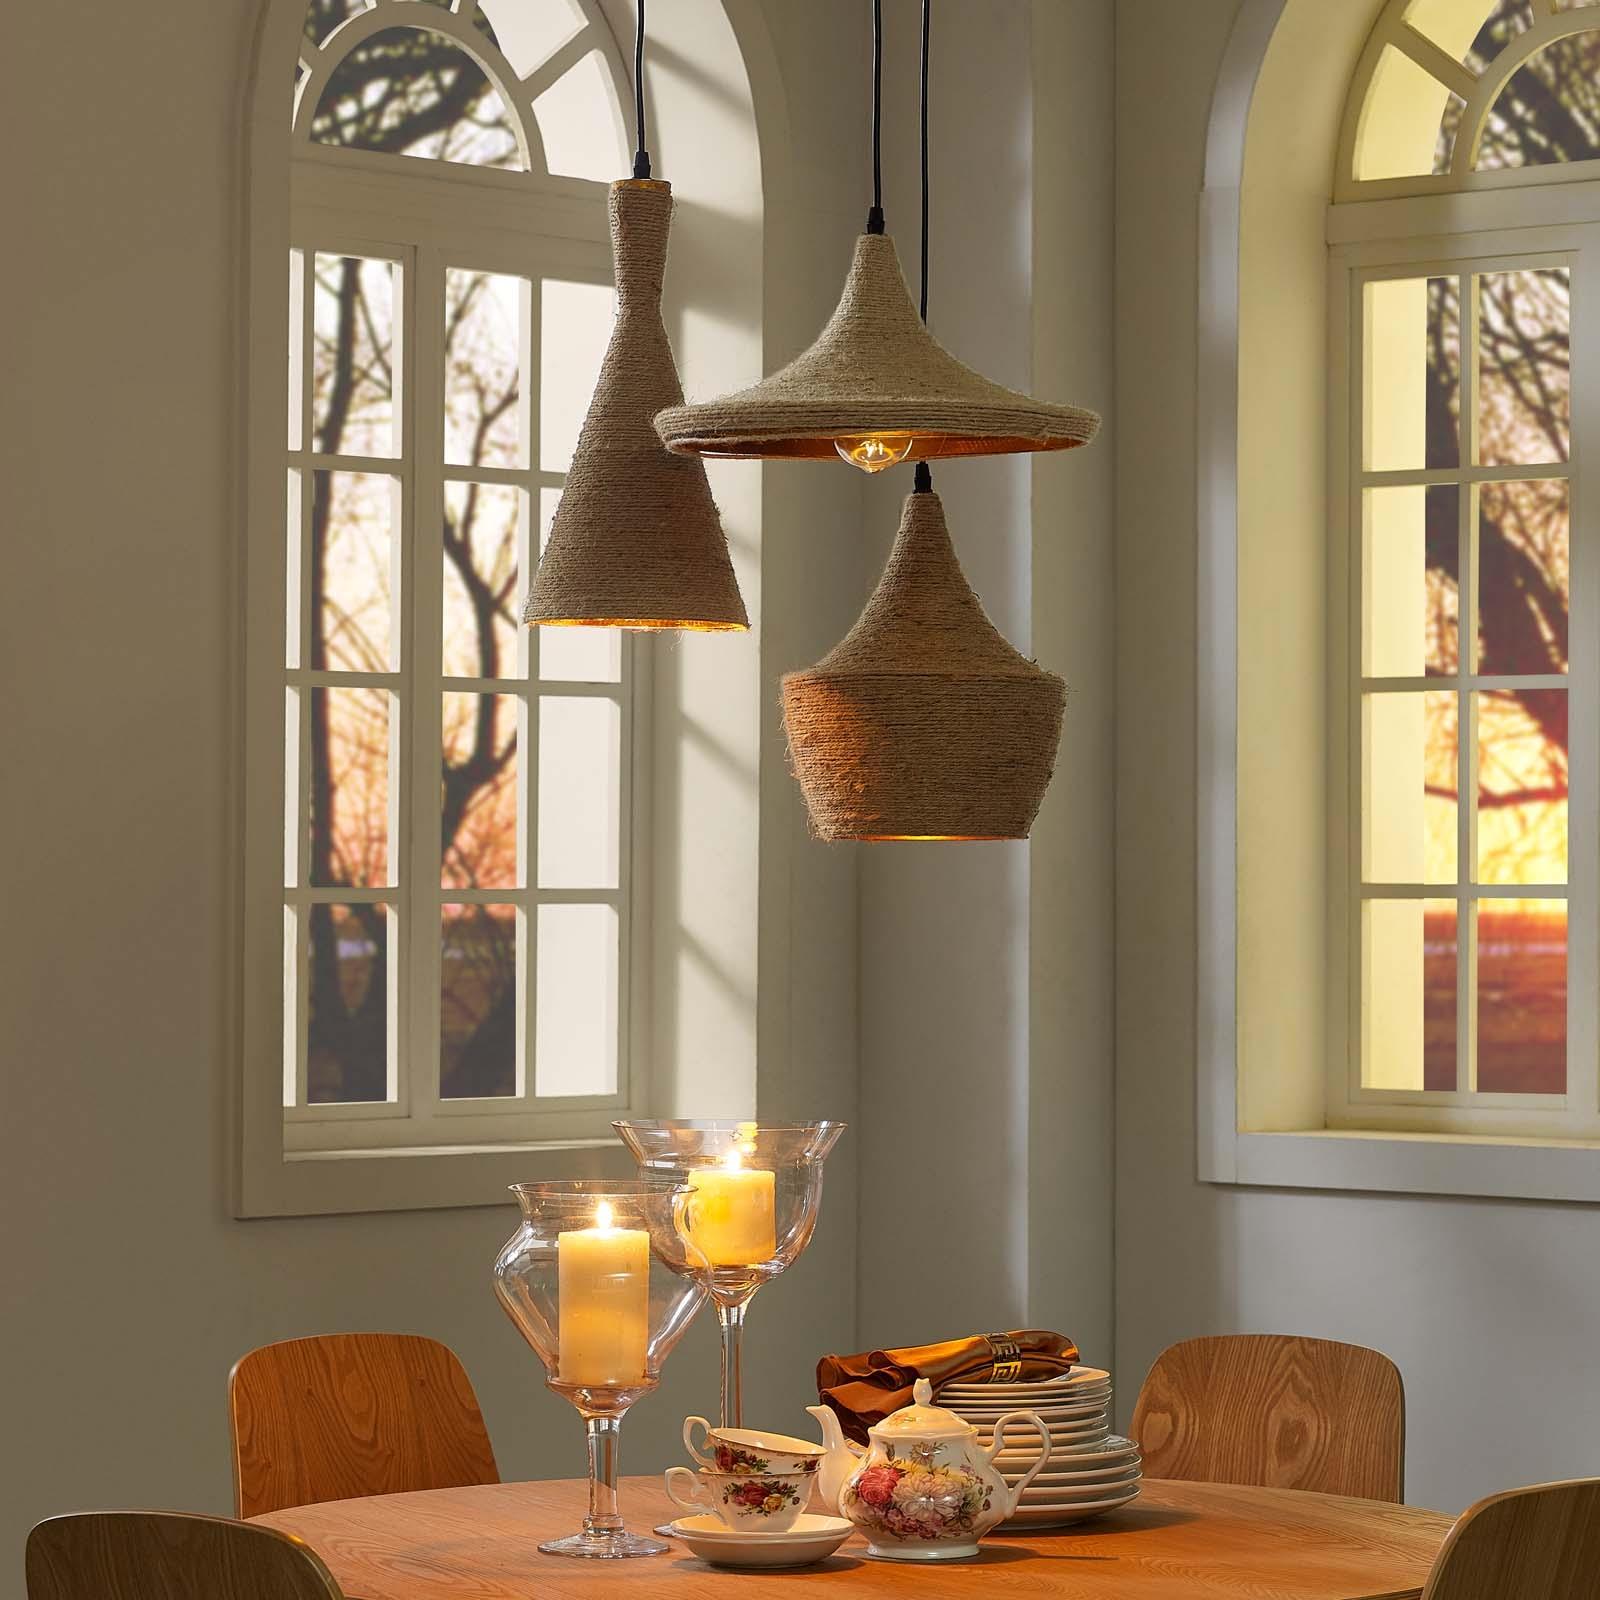 Morph 3 Pendant Light Ceiling Fixture